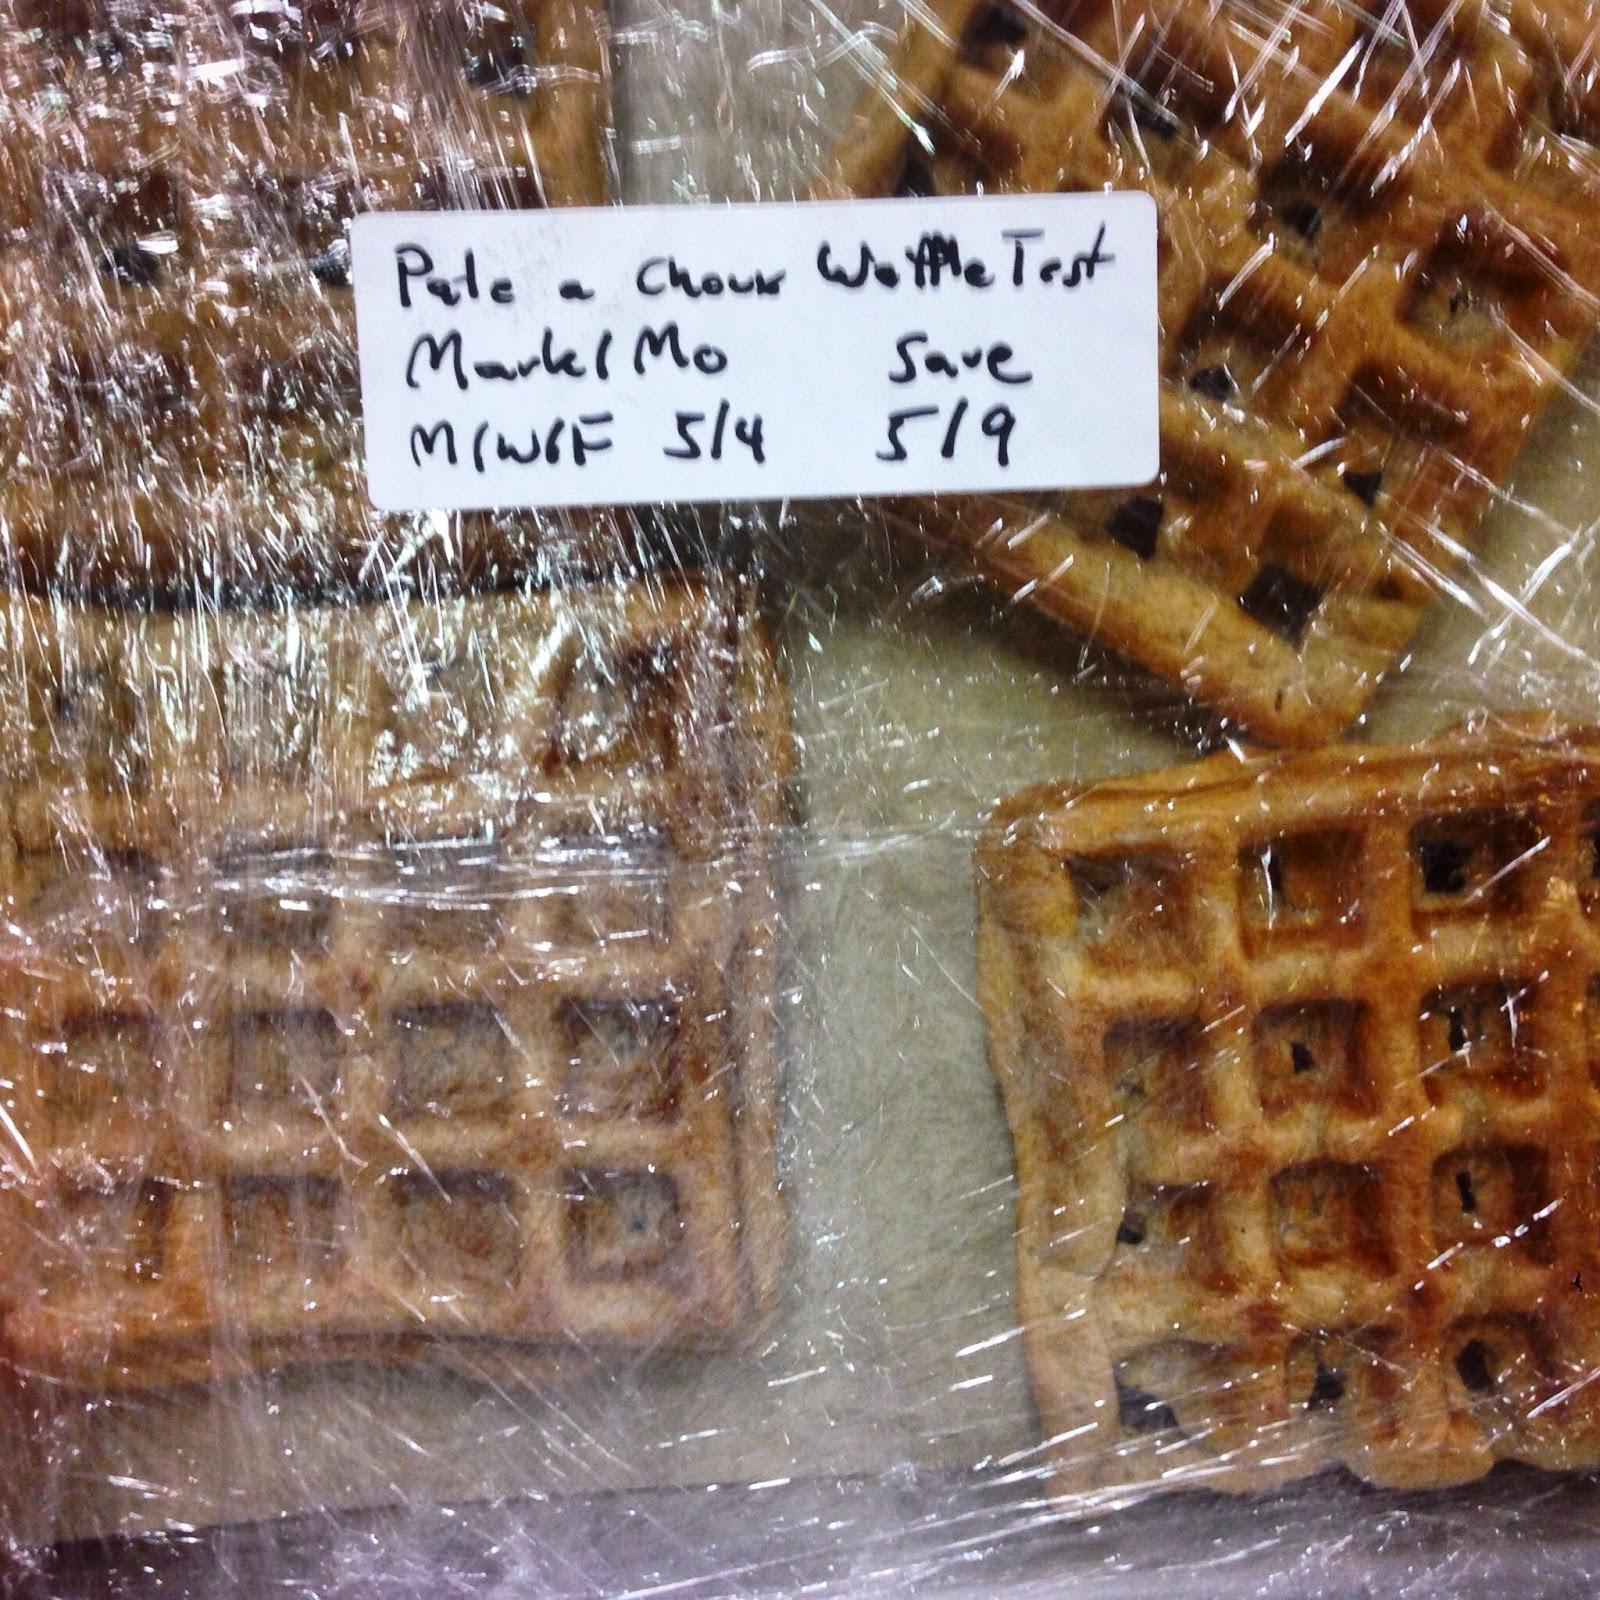 Pate a Choux Waffle Test